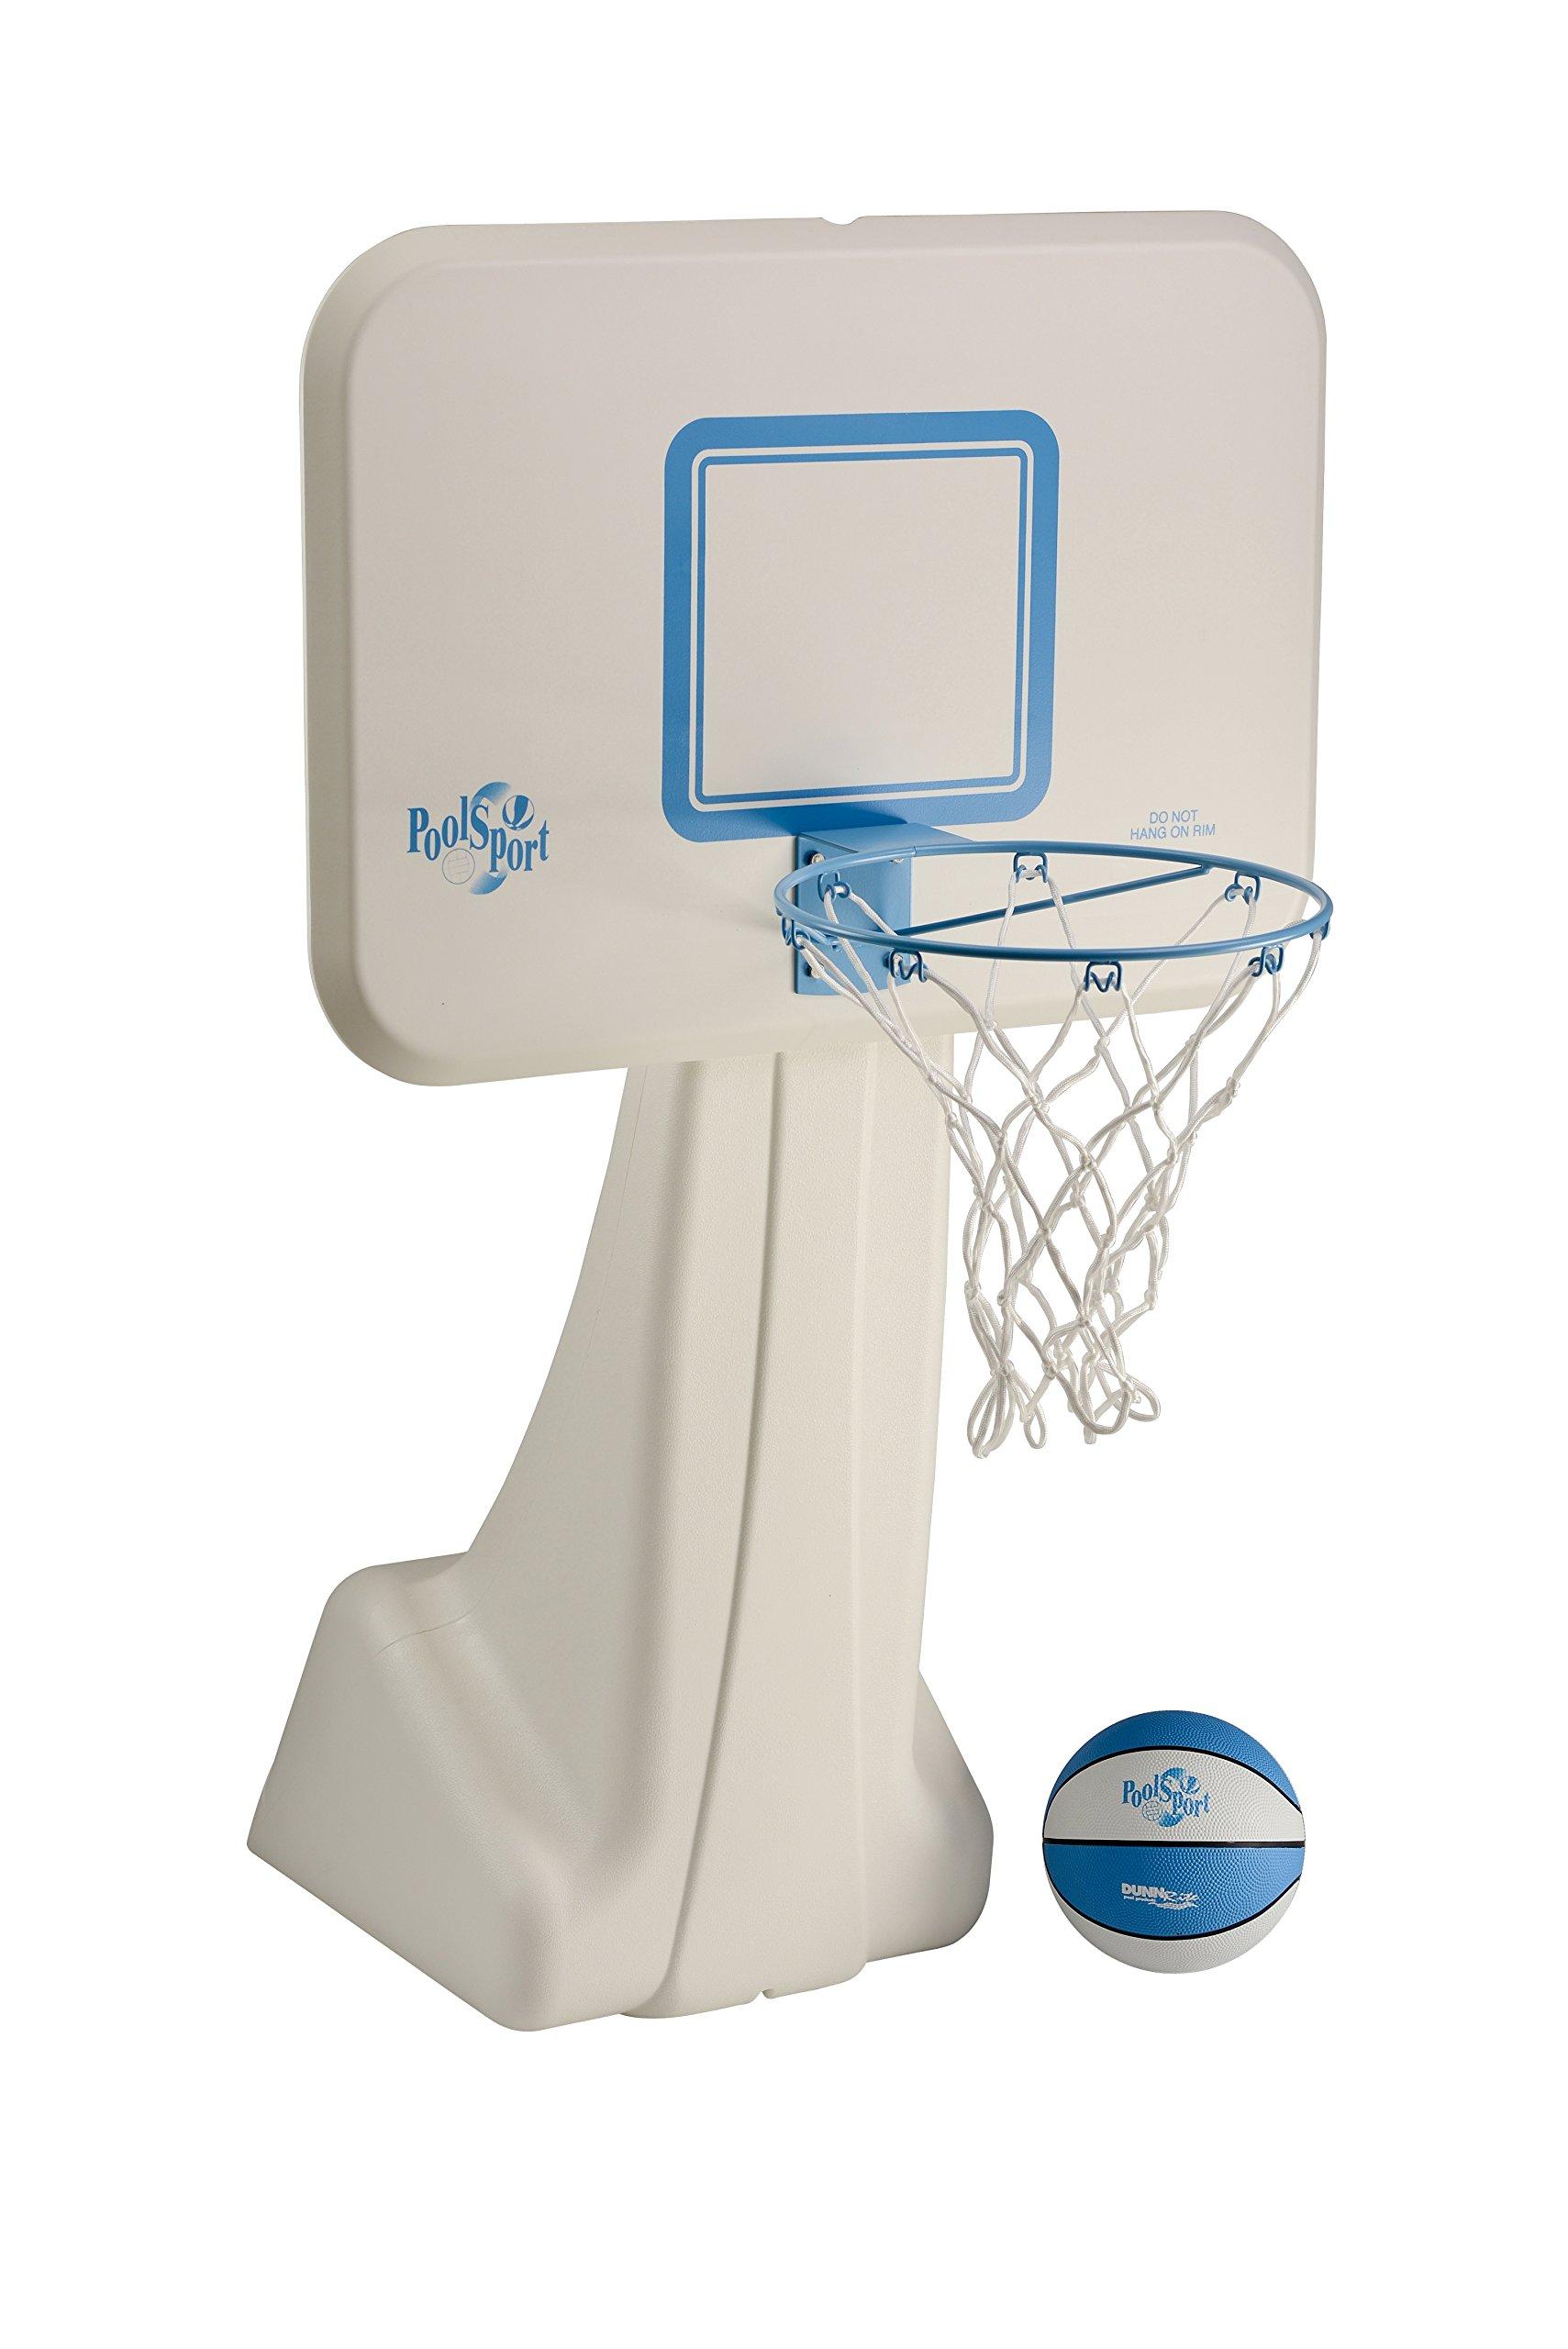 Dunnrite PoolSport pool basketball (B950) 13.5 inch stainless steel rim